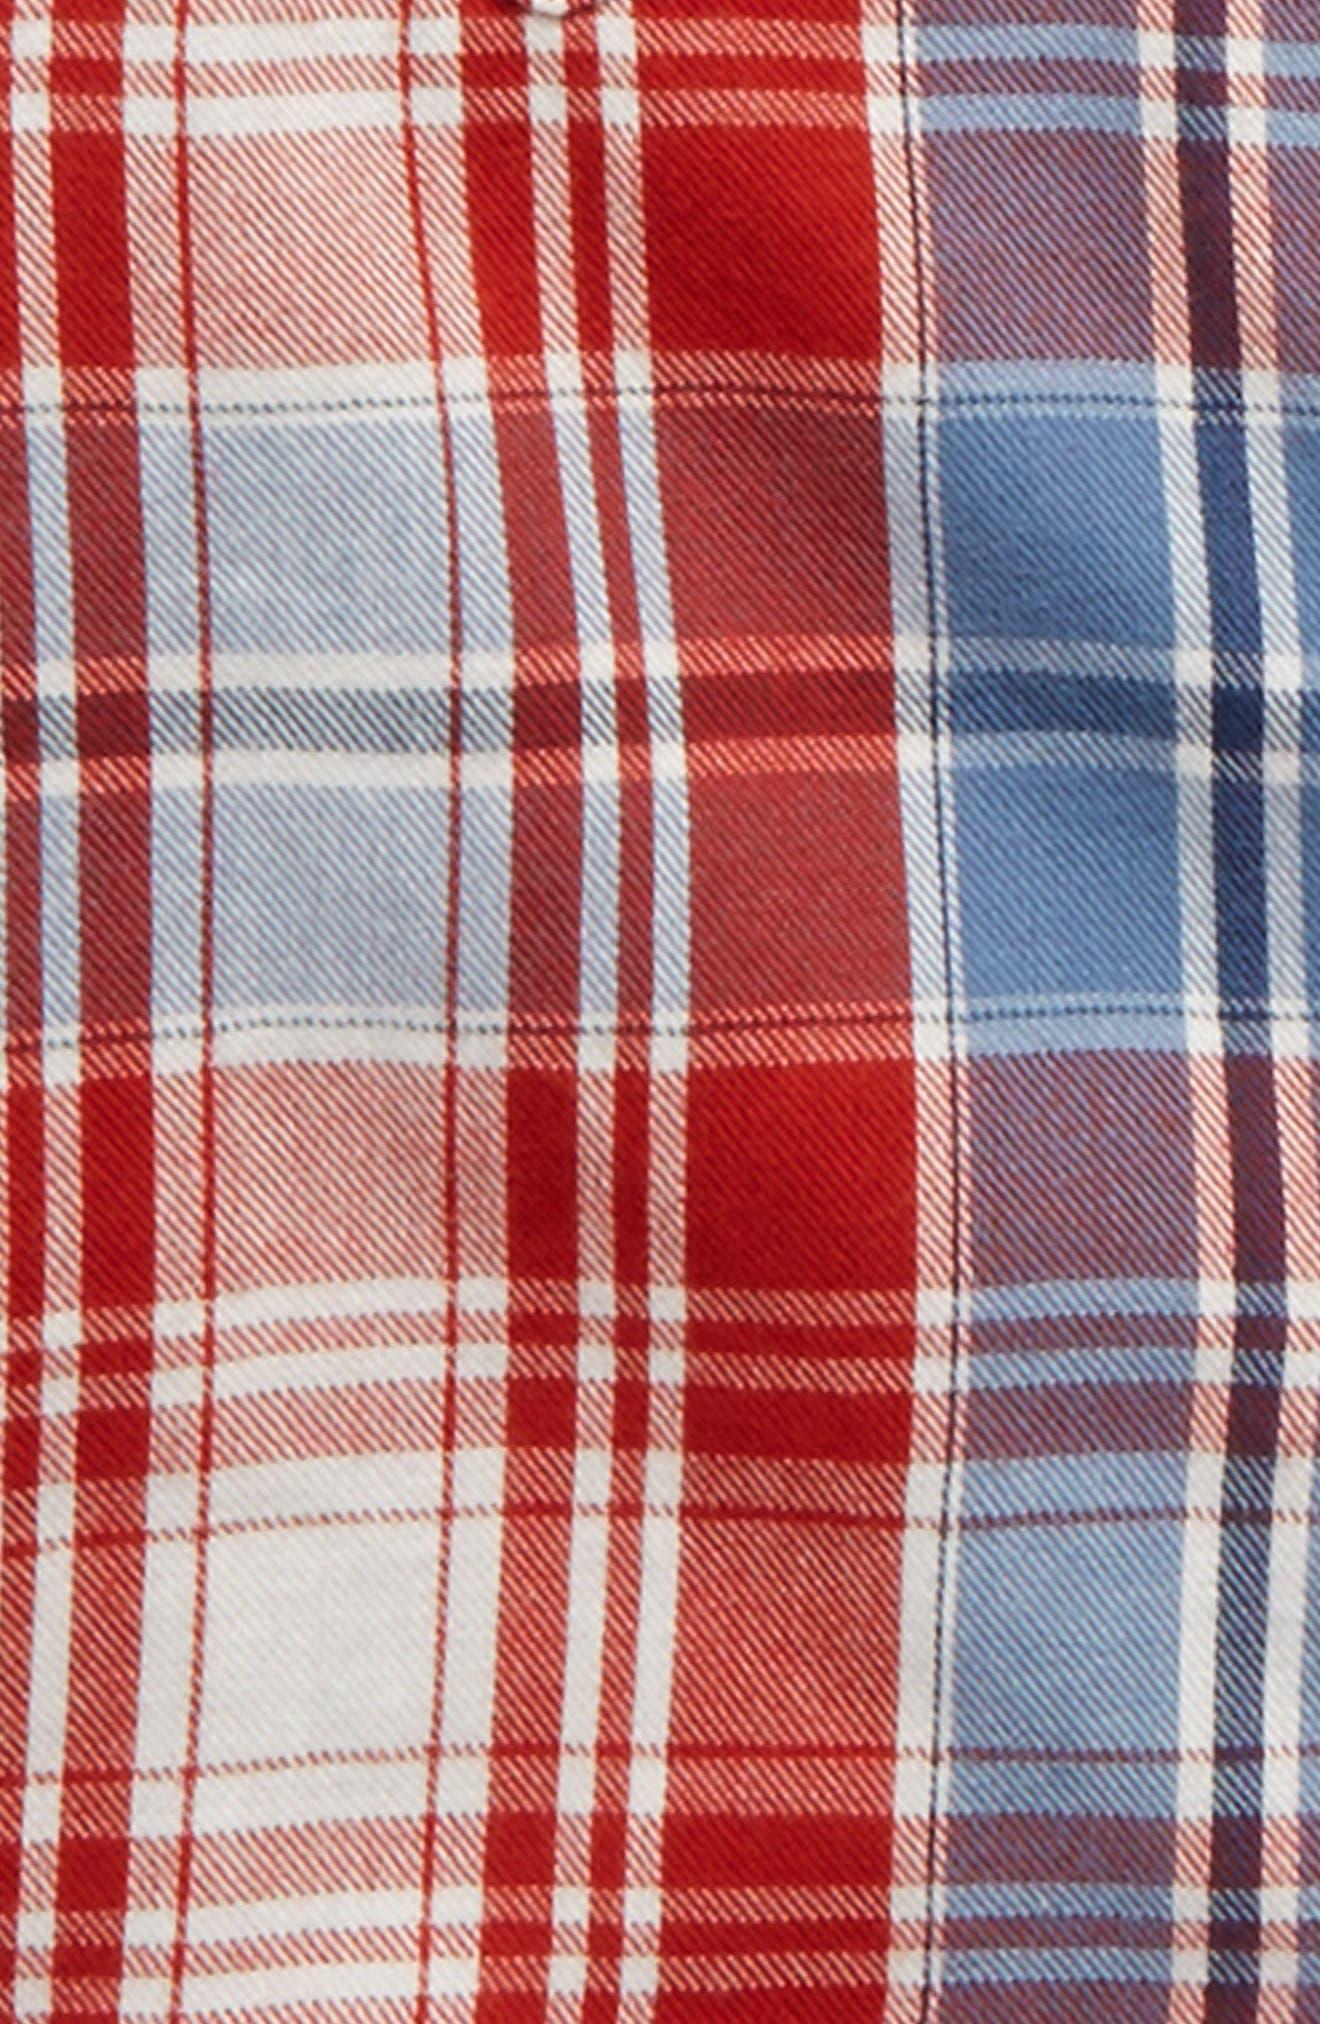 Alternate Image 2  - Tucker + Tate Plaid Double Cloth Shirt (Toddler Boys & Little Boys)